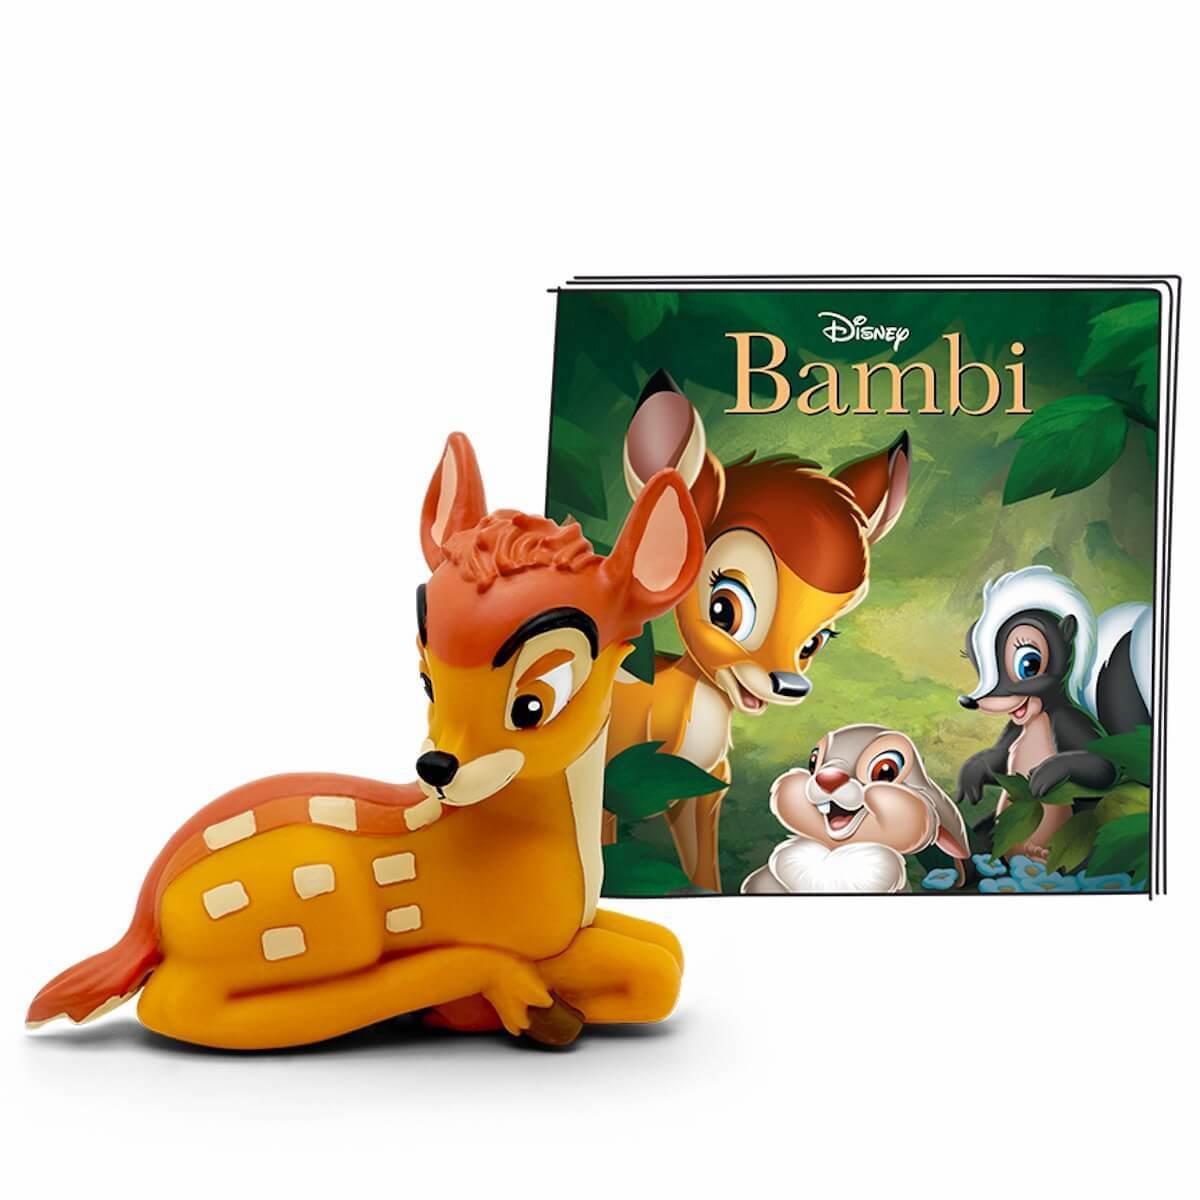 Hörspielfigur TONIES Disney Bambi